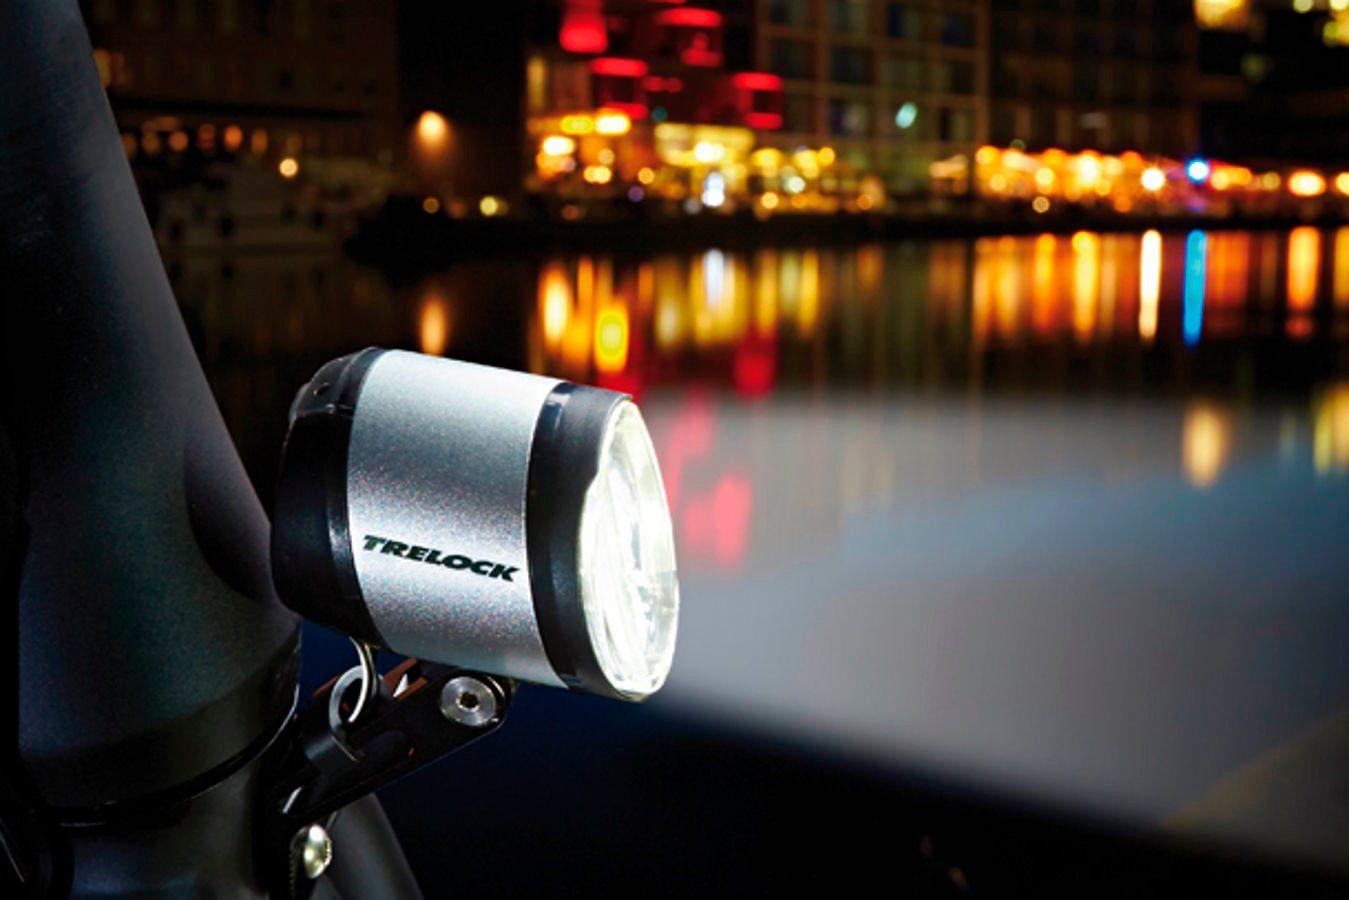 Trelock Fahrradbeleuchtung »LS 910 Prio 50 E-Bike Frontleuchte 6-12V«